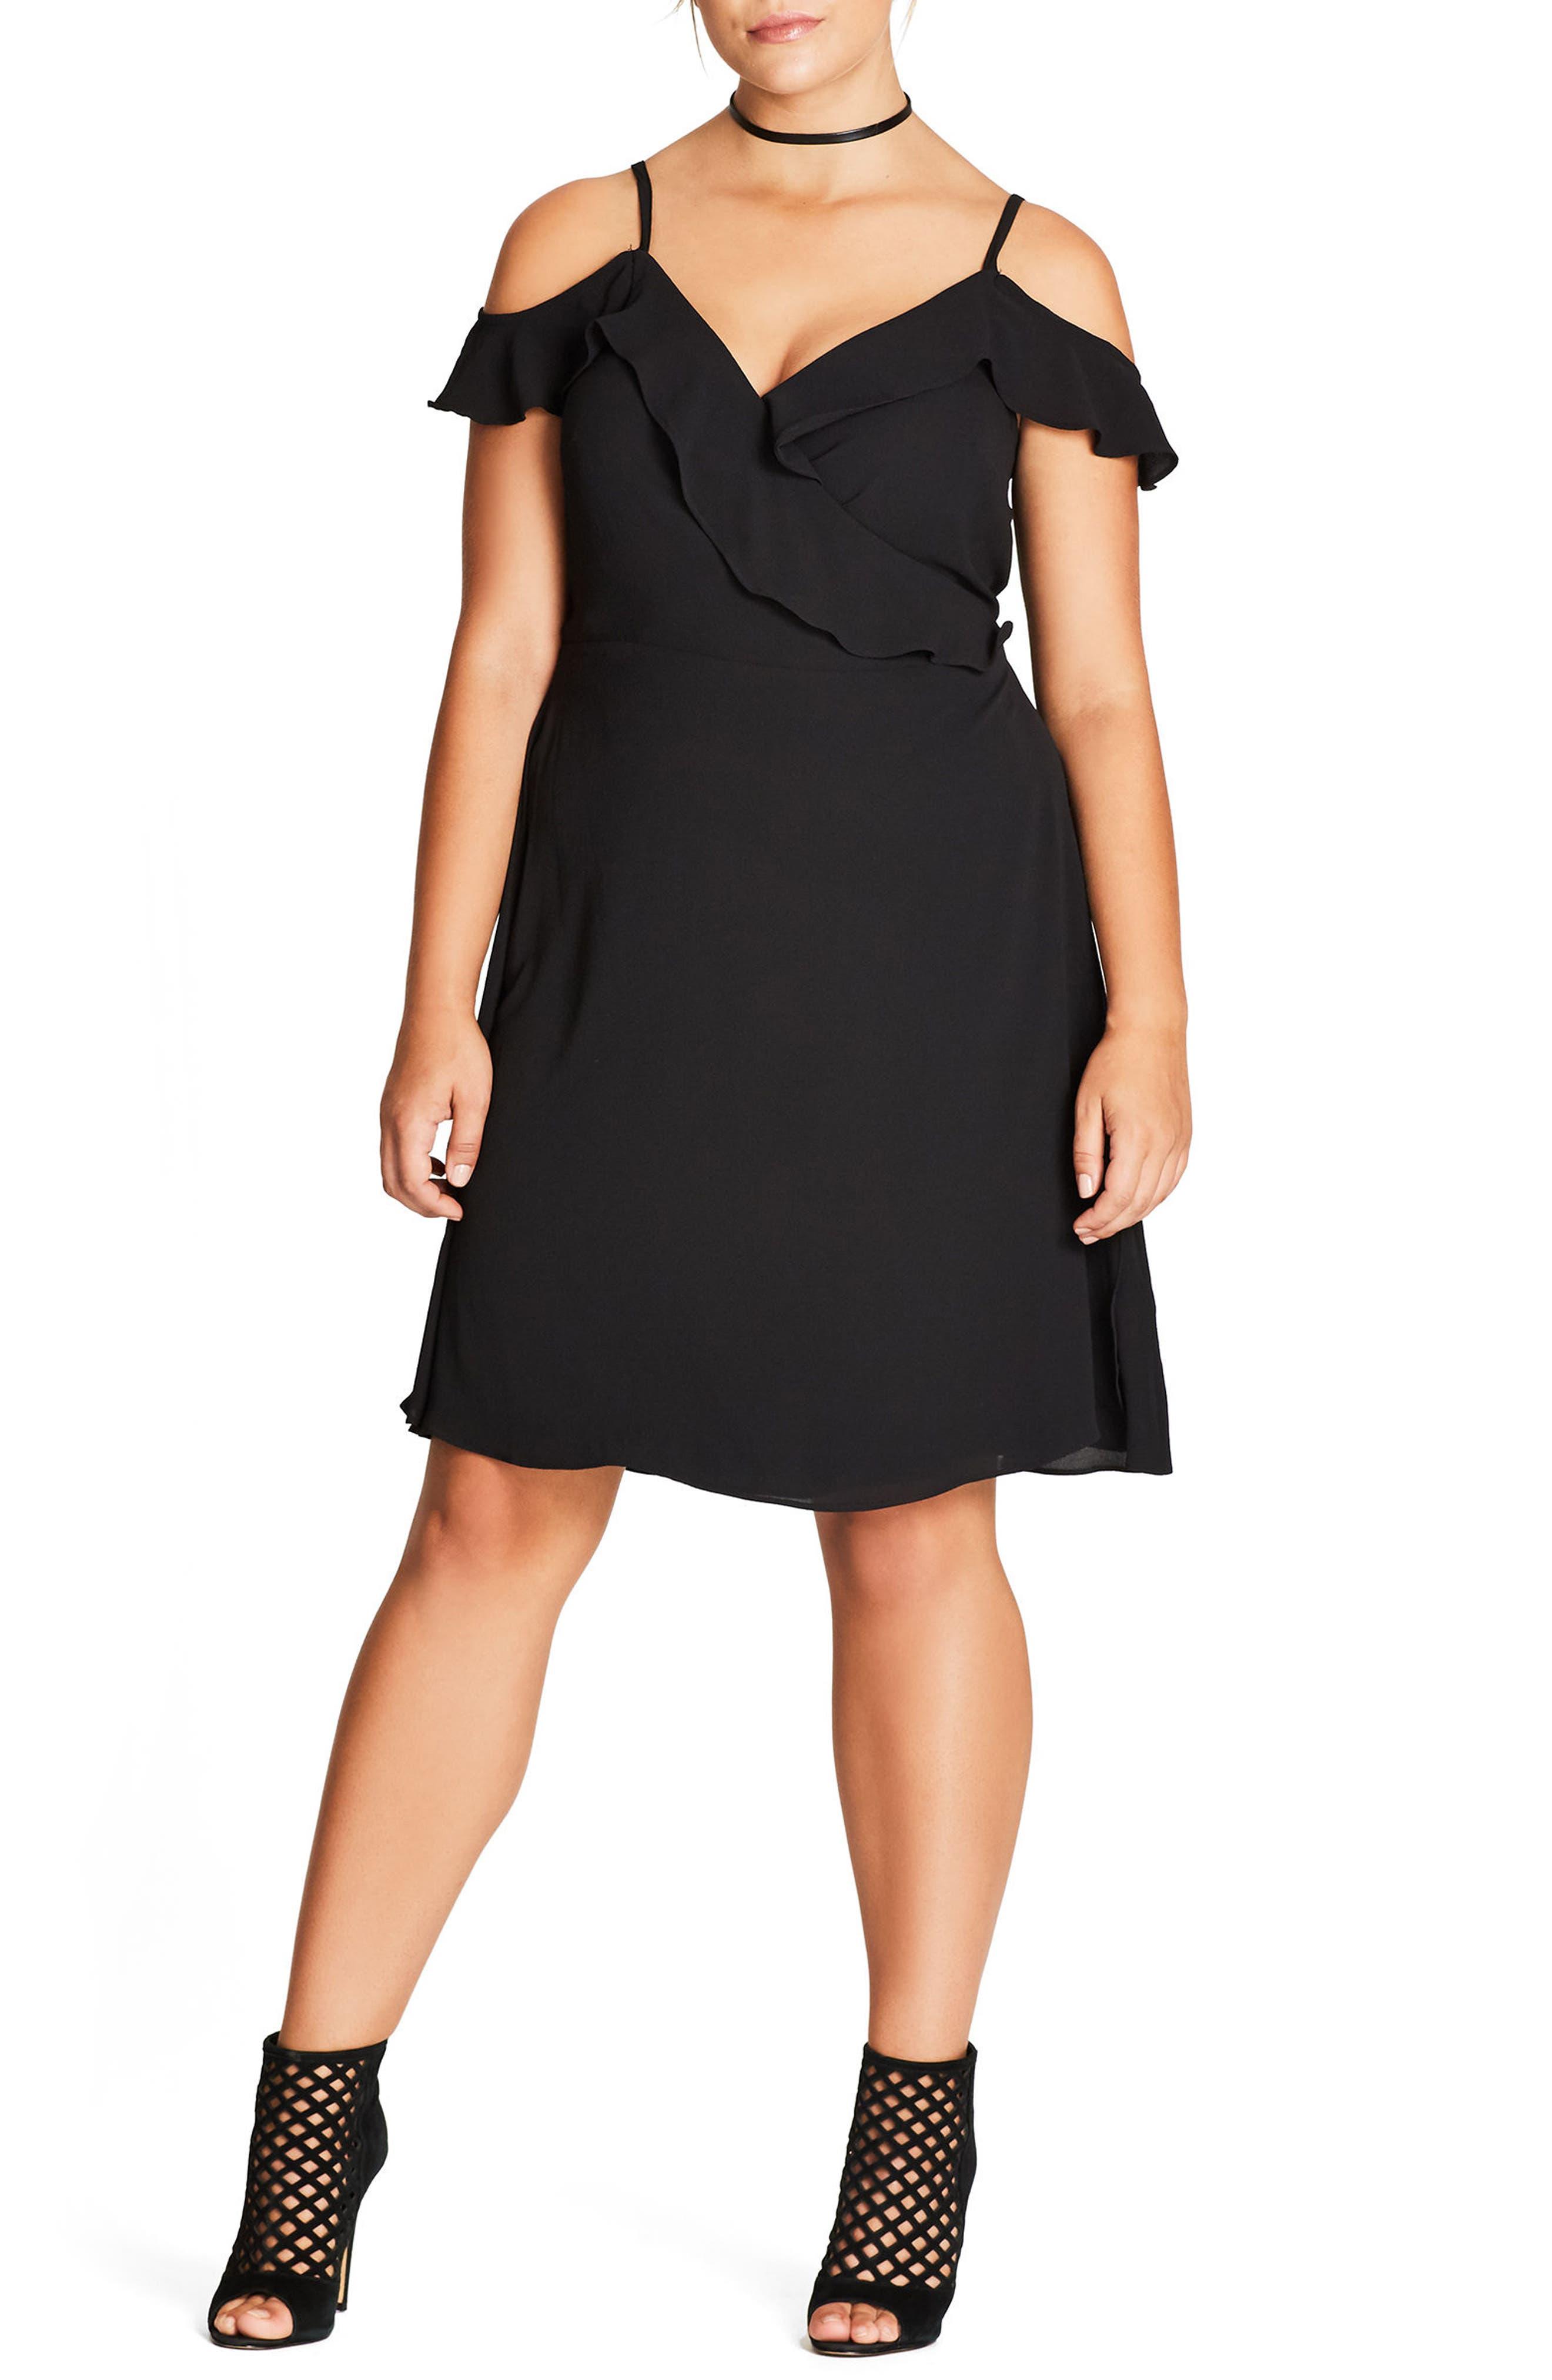 Alternate Image 1 Selected - City Chic Lulu Faux Wrap Dress (Plus Size)